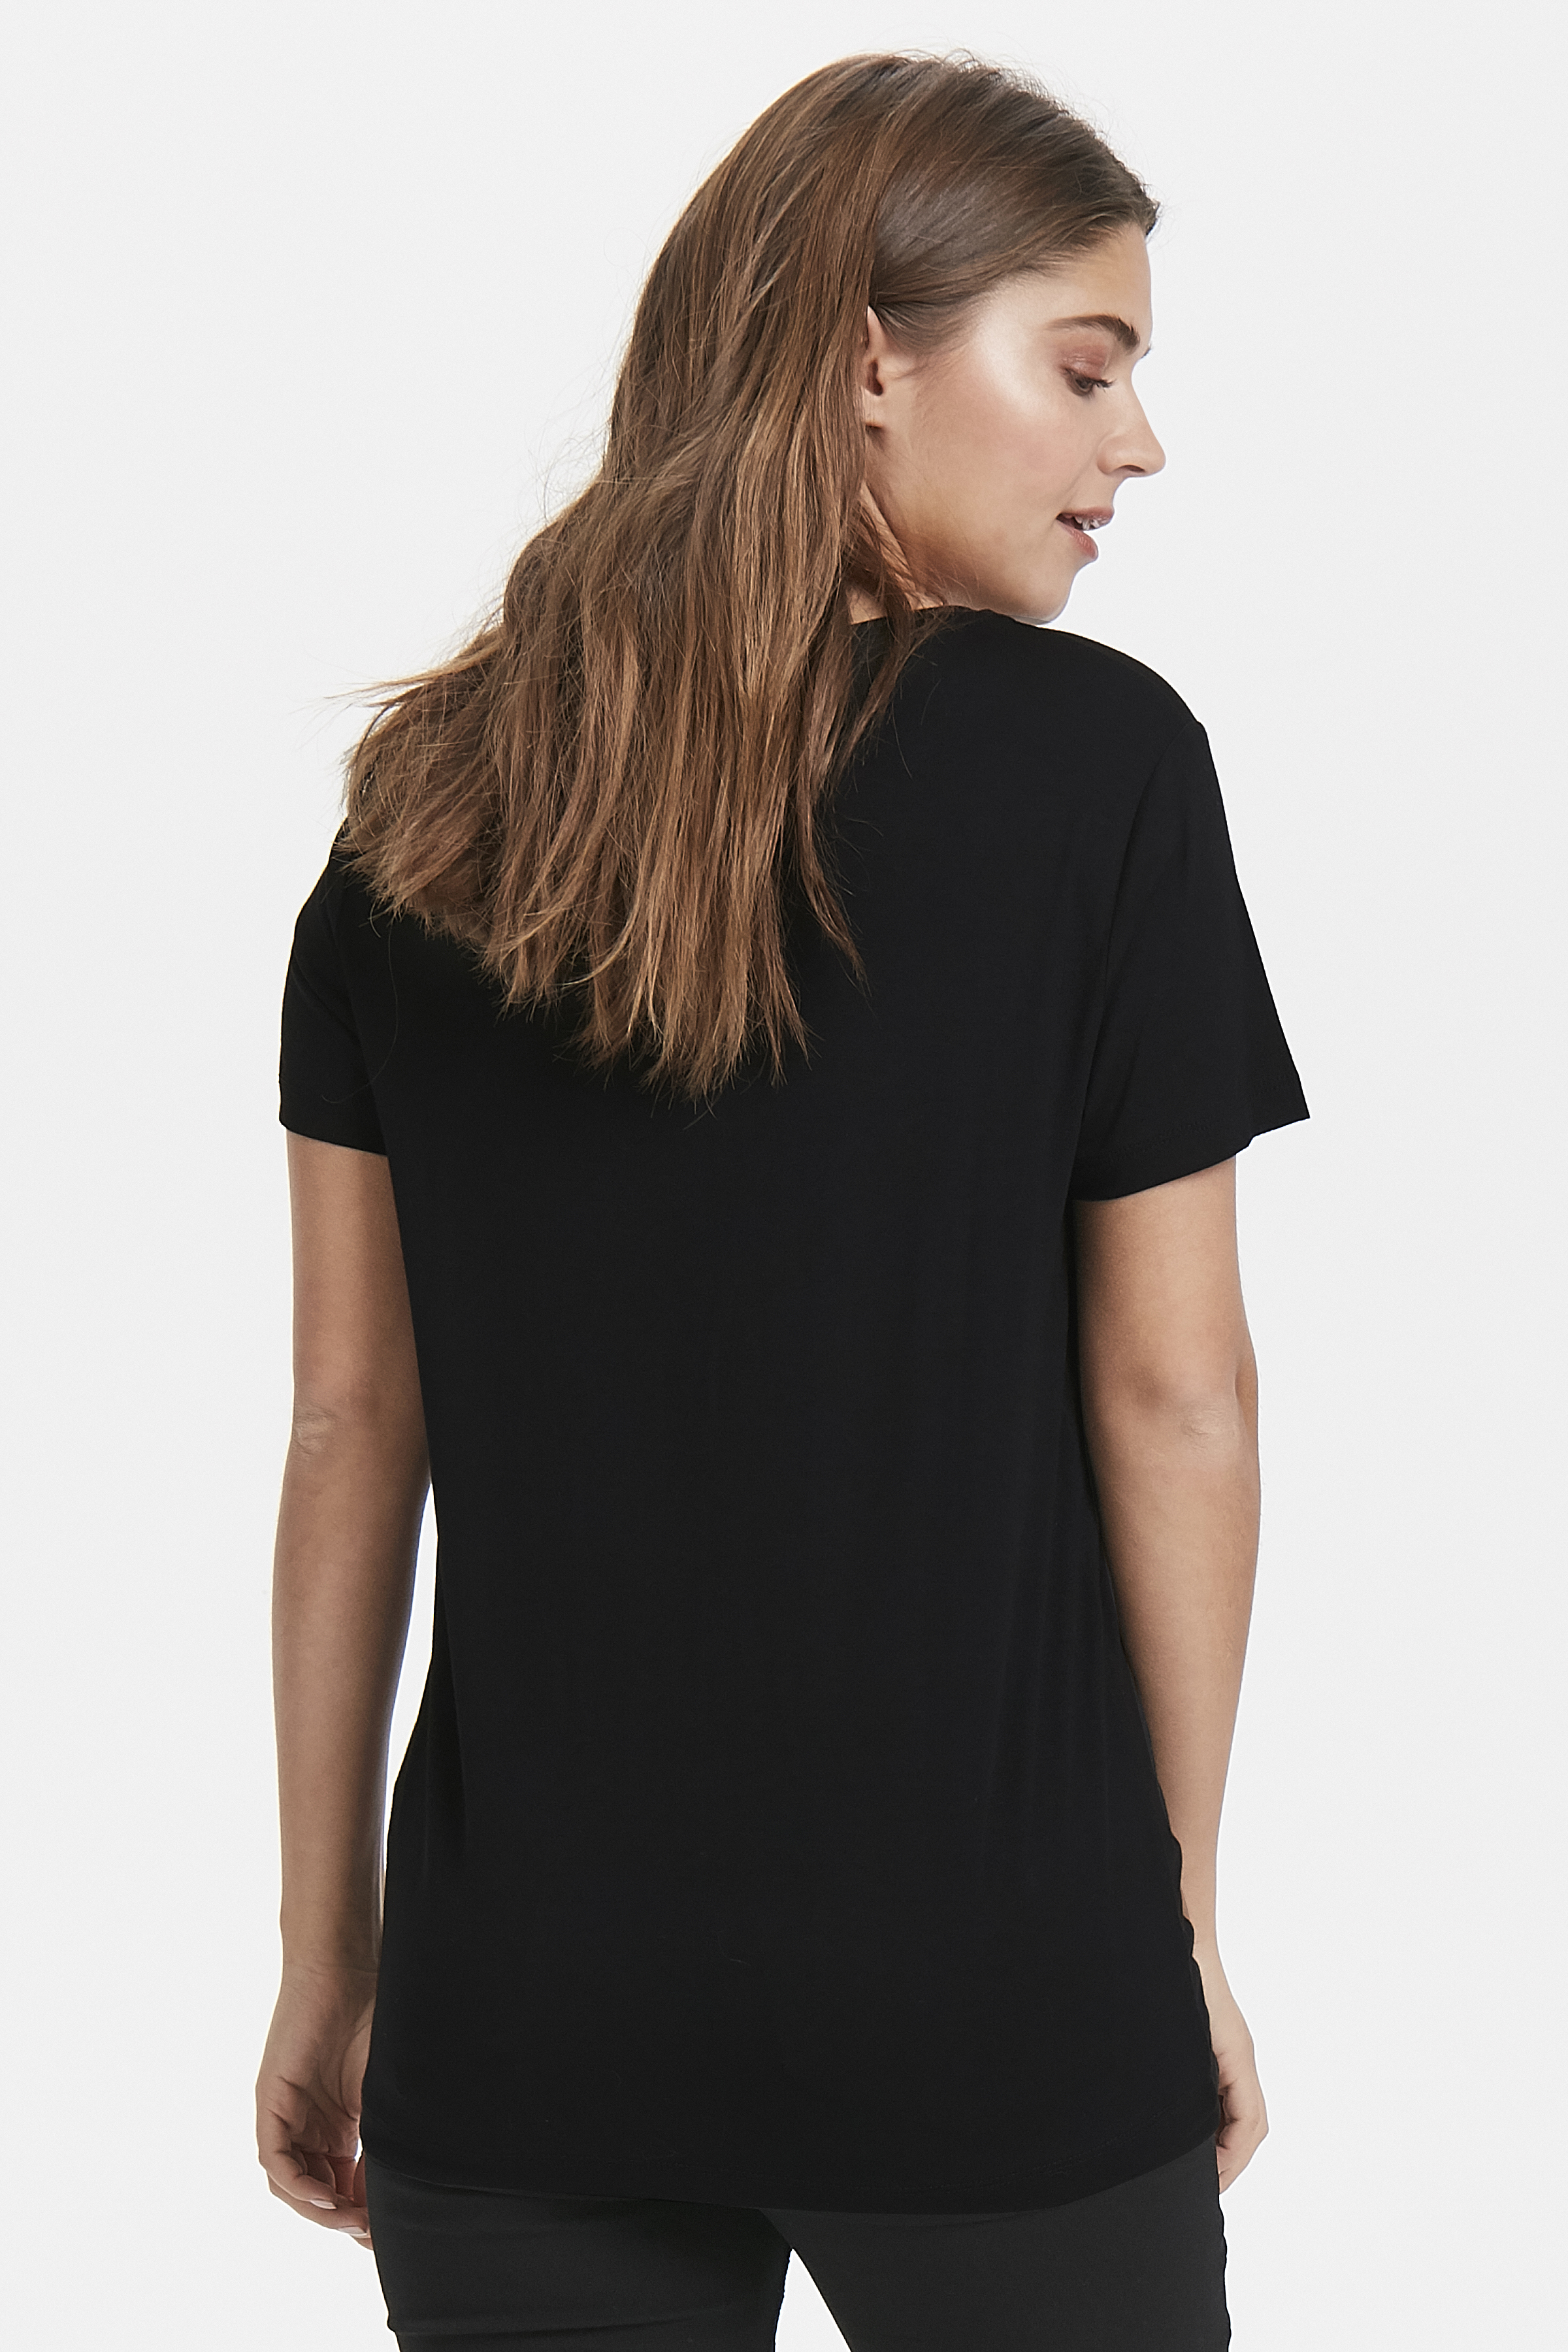 Black combi 1 T-shirt från b.young – Köp Black combi 1 T-shirt från storlek XS-XL här